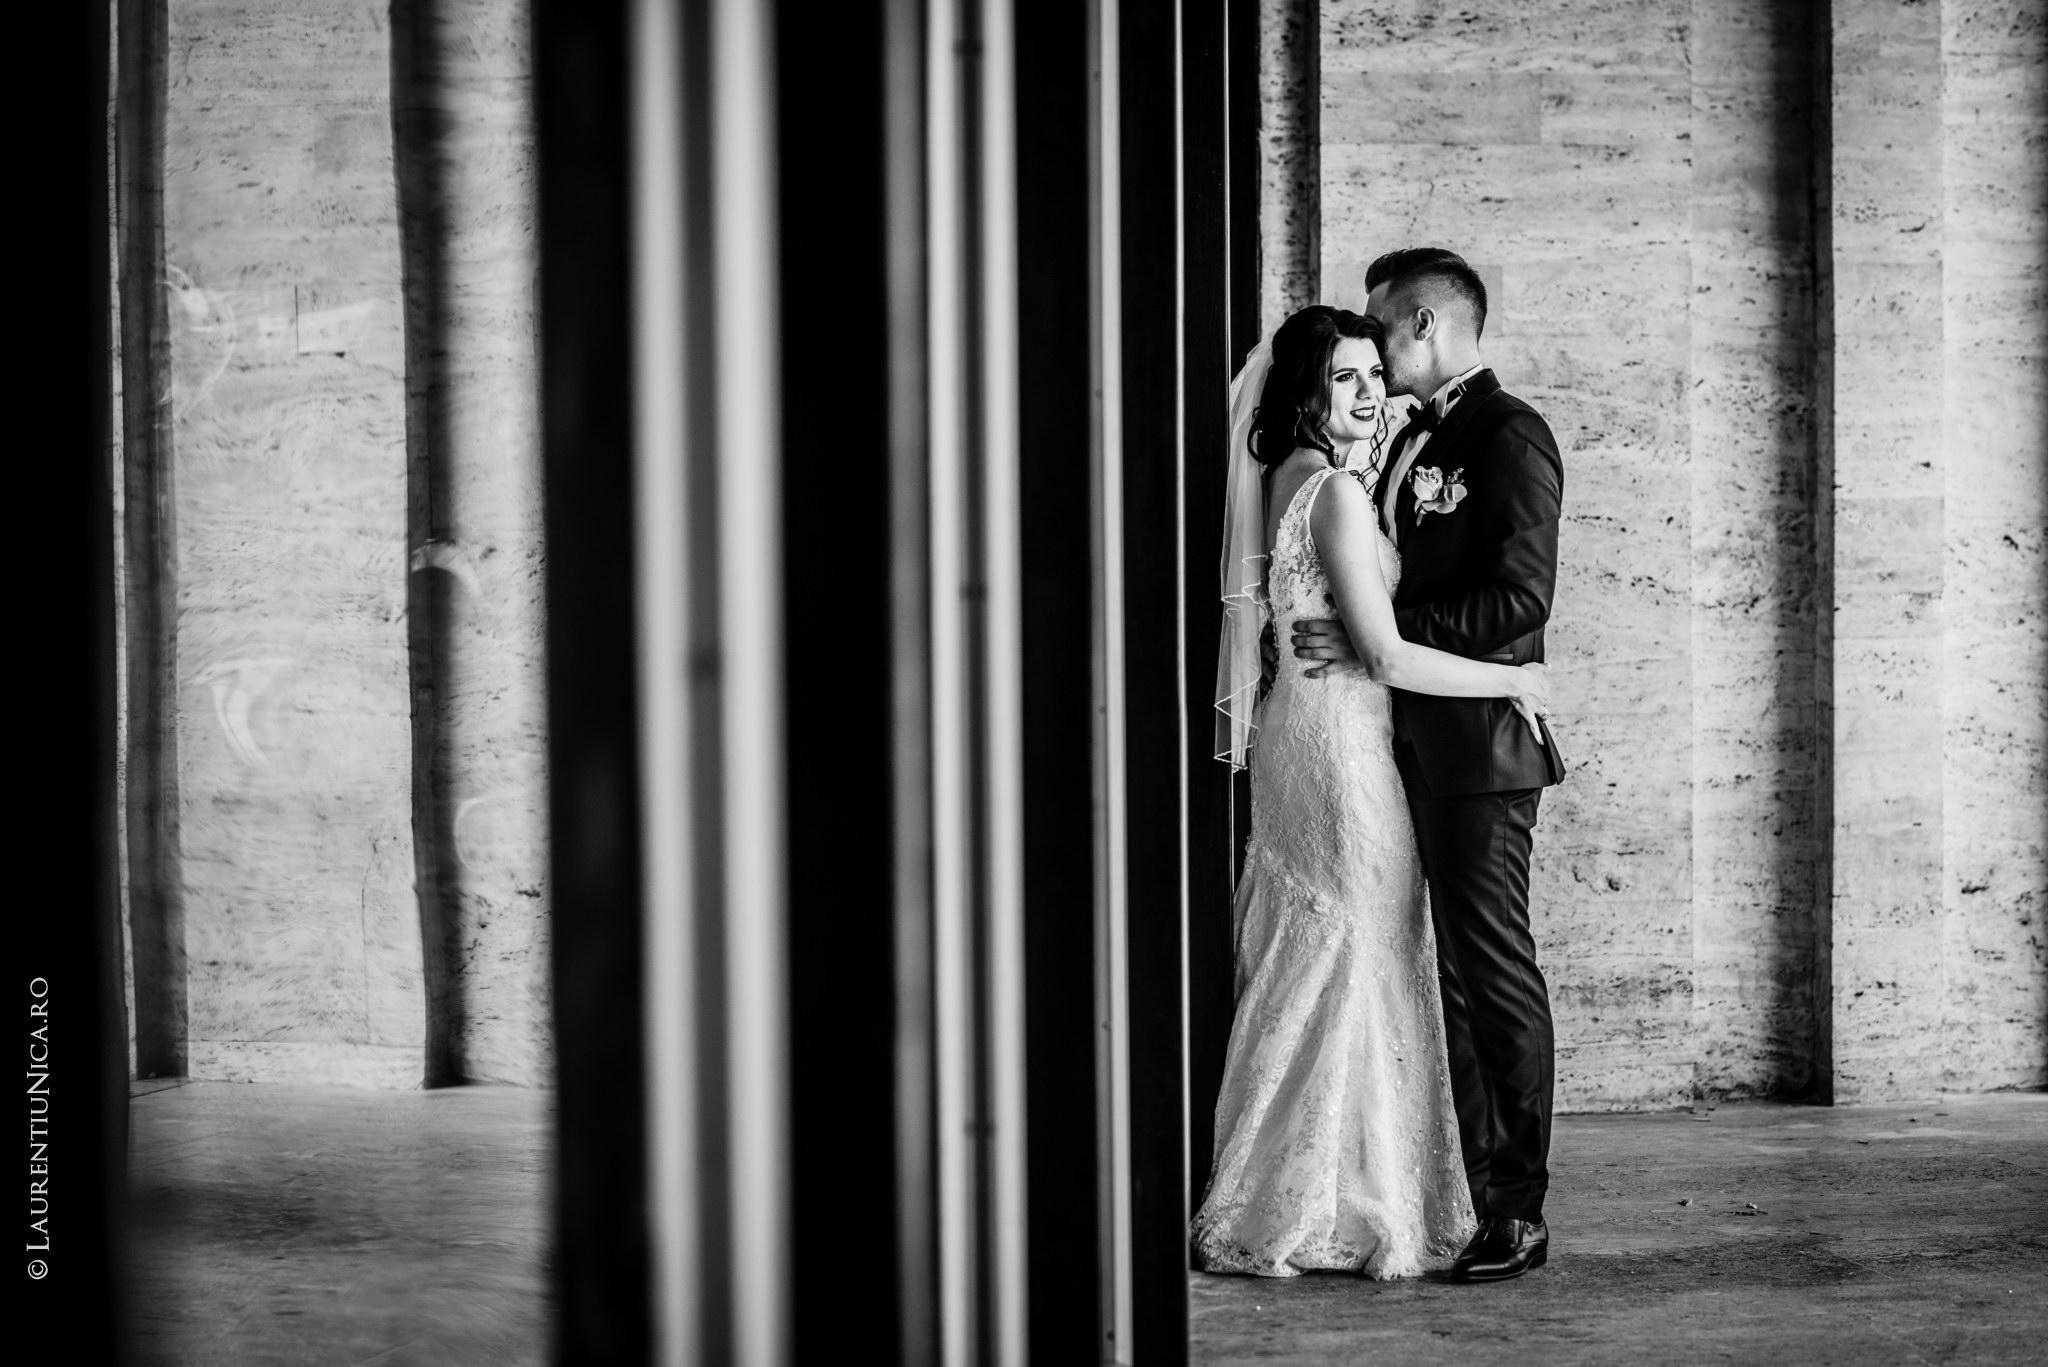 fotografii nunta craiova bia alex fotograf nunta laurentiu nica 31 - Bia & Alex | Fotografii nunta | Craiova